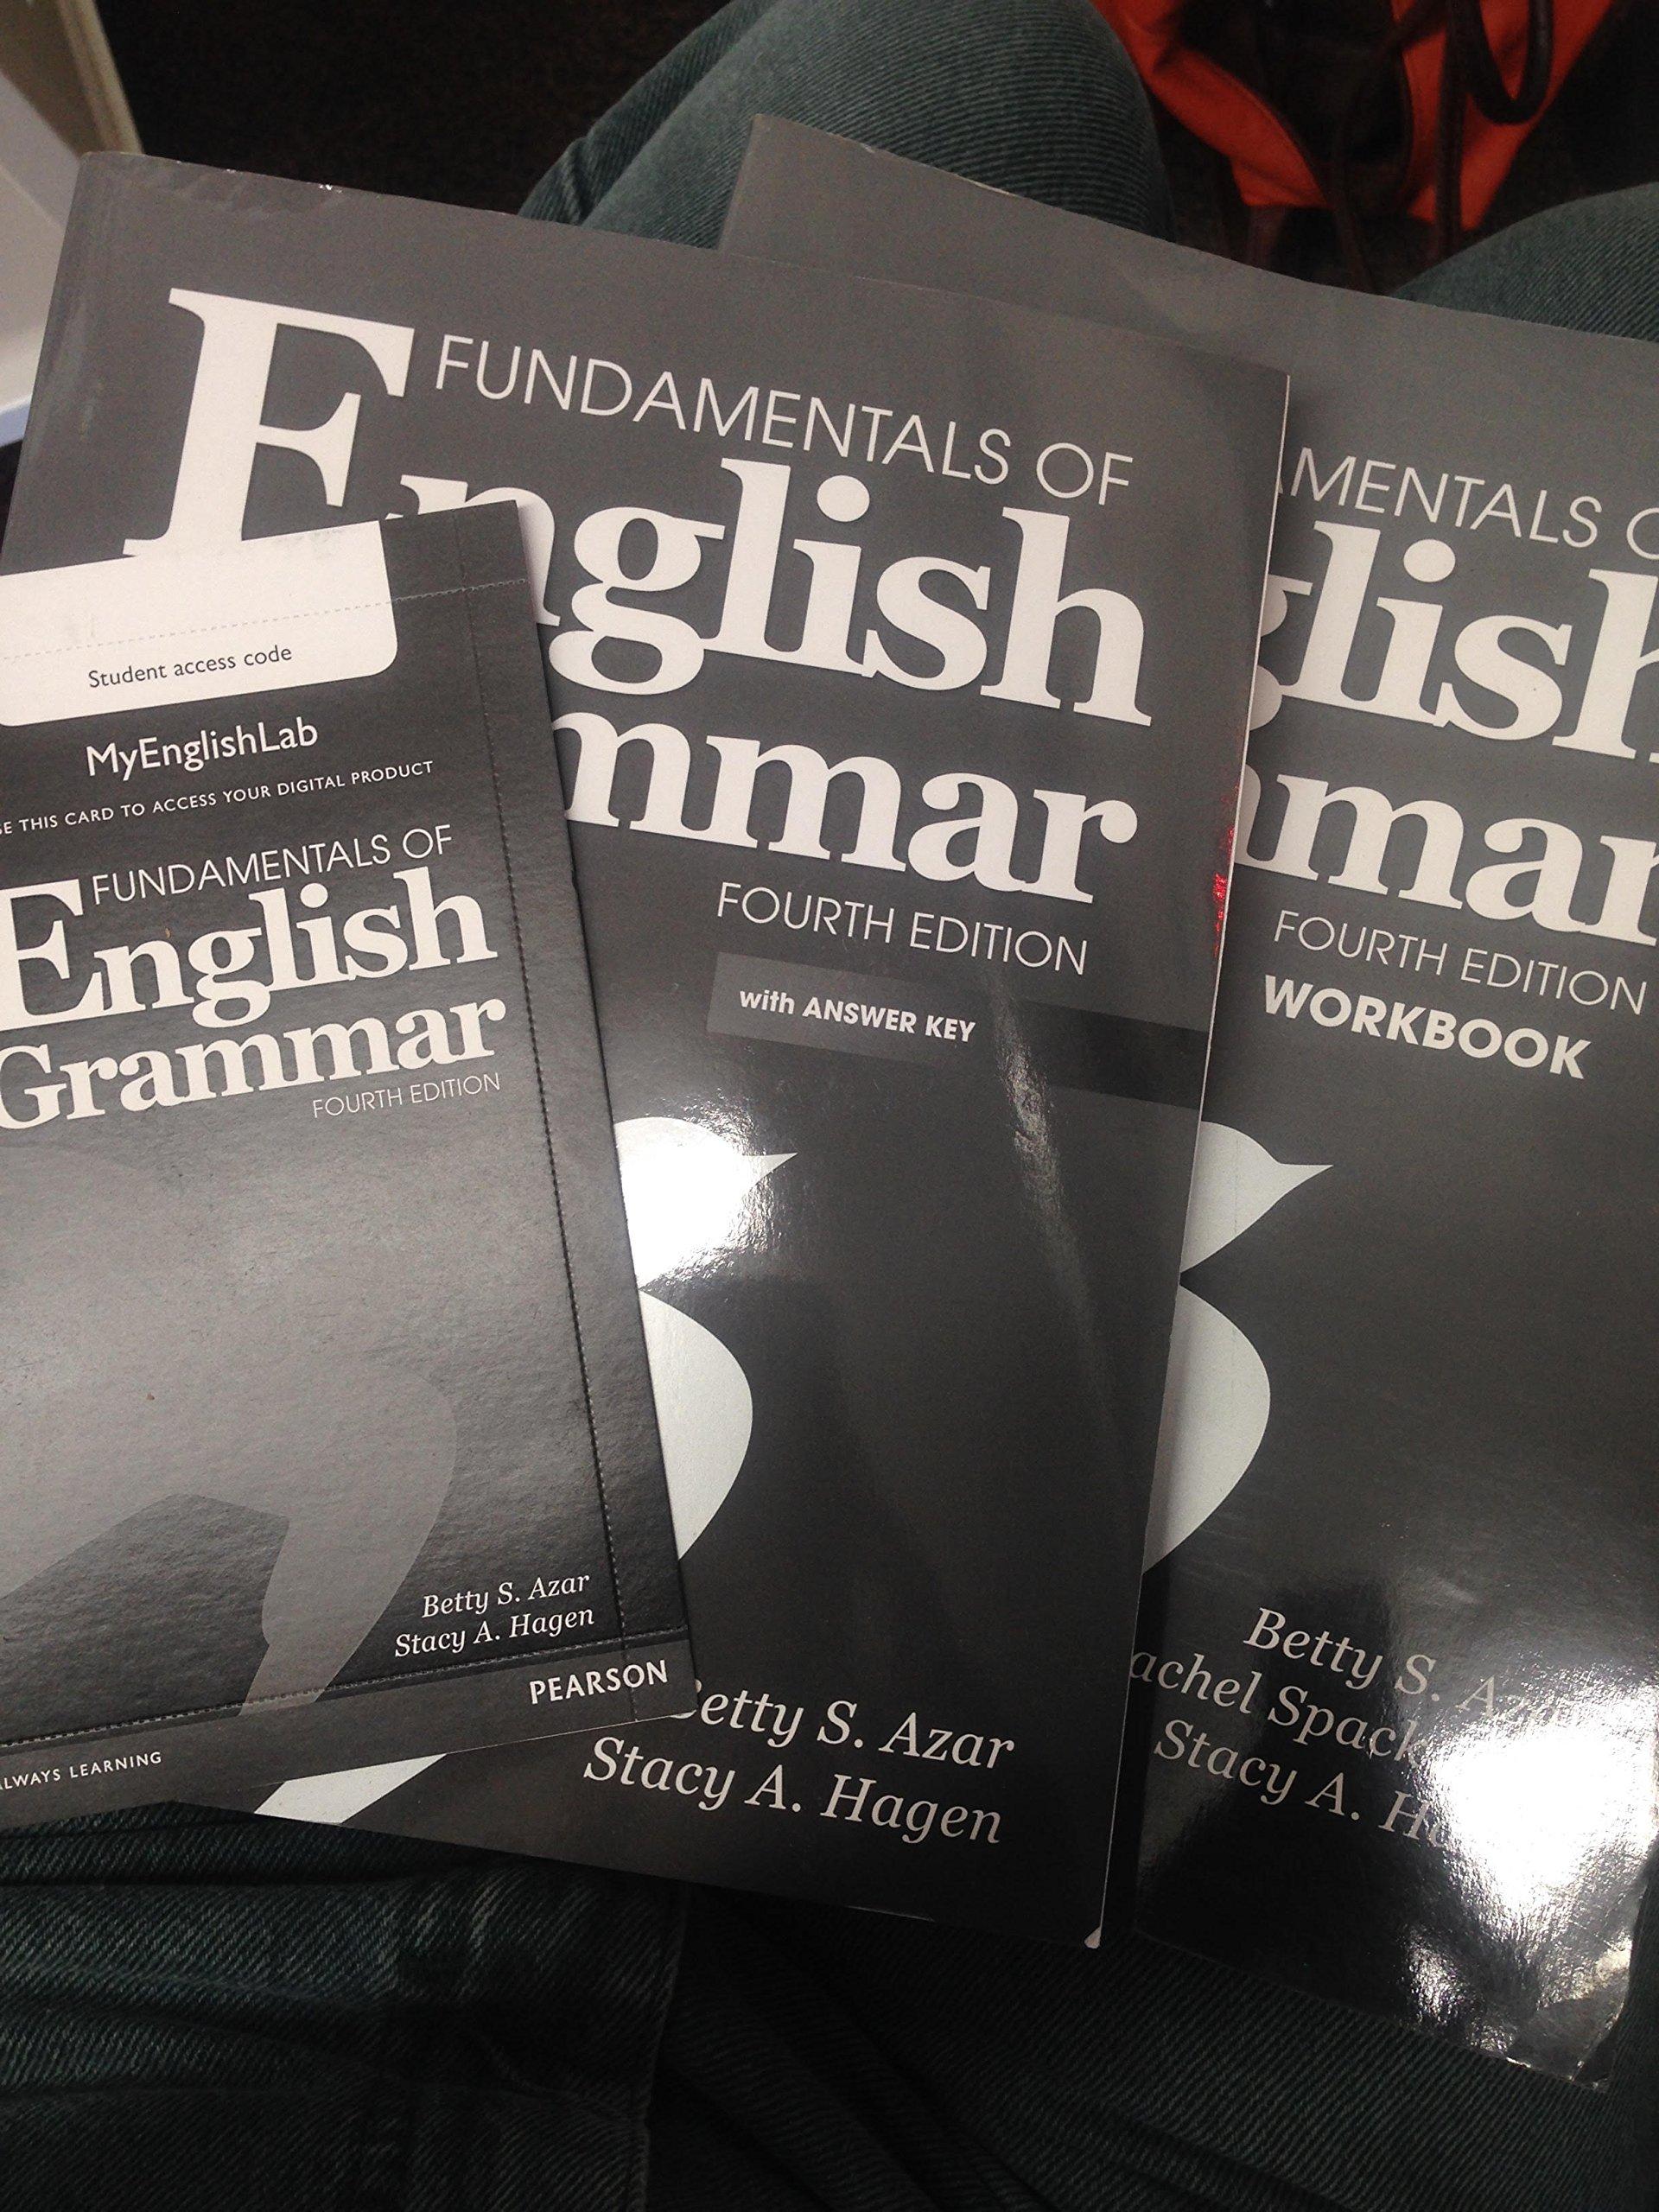 fundamentals of english grammar 4th edition free download